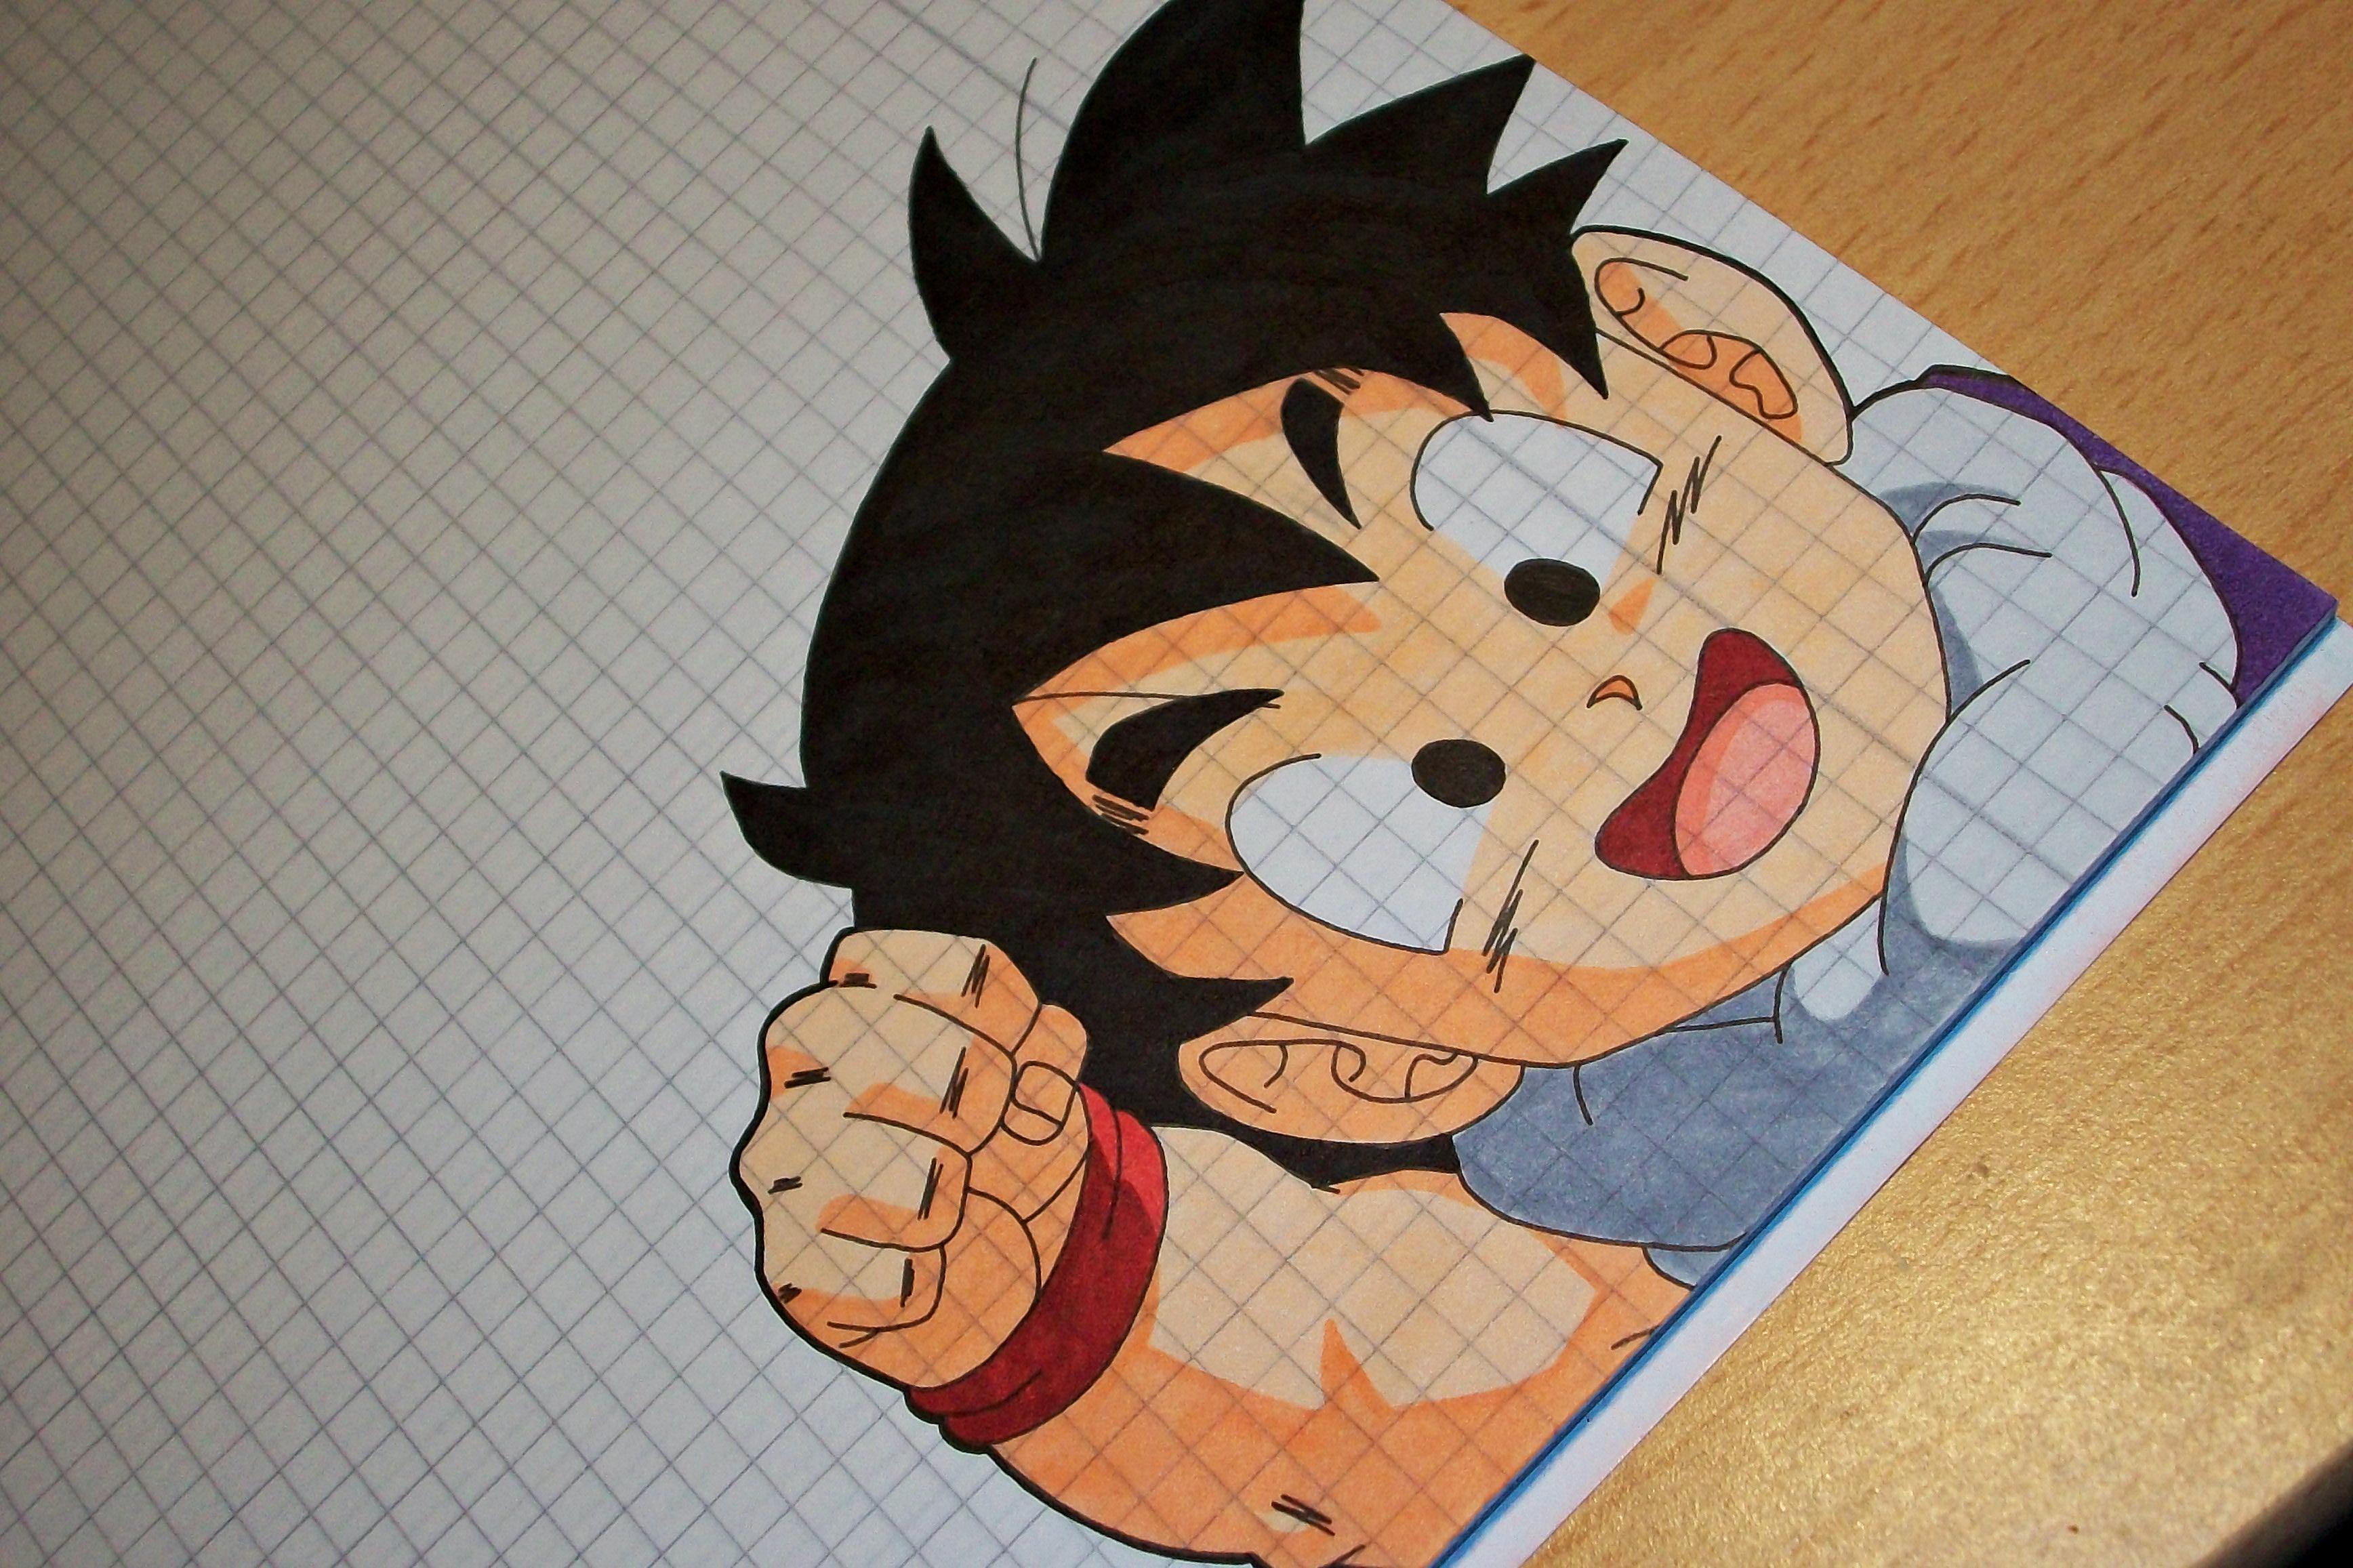 Tegami Art No.29 .:Son Gohan (Piccolo's student):. by SakakiTheMastermind